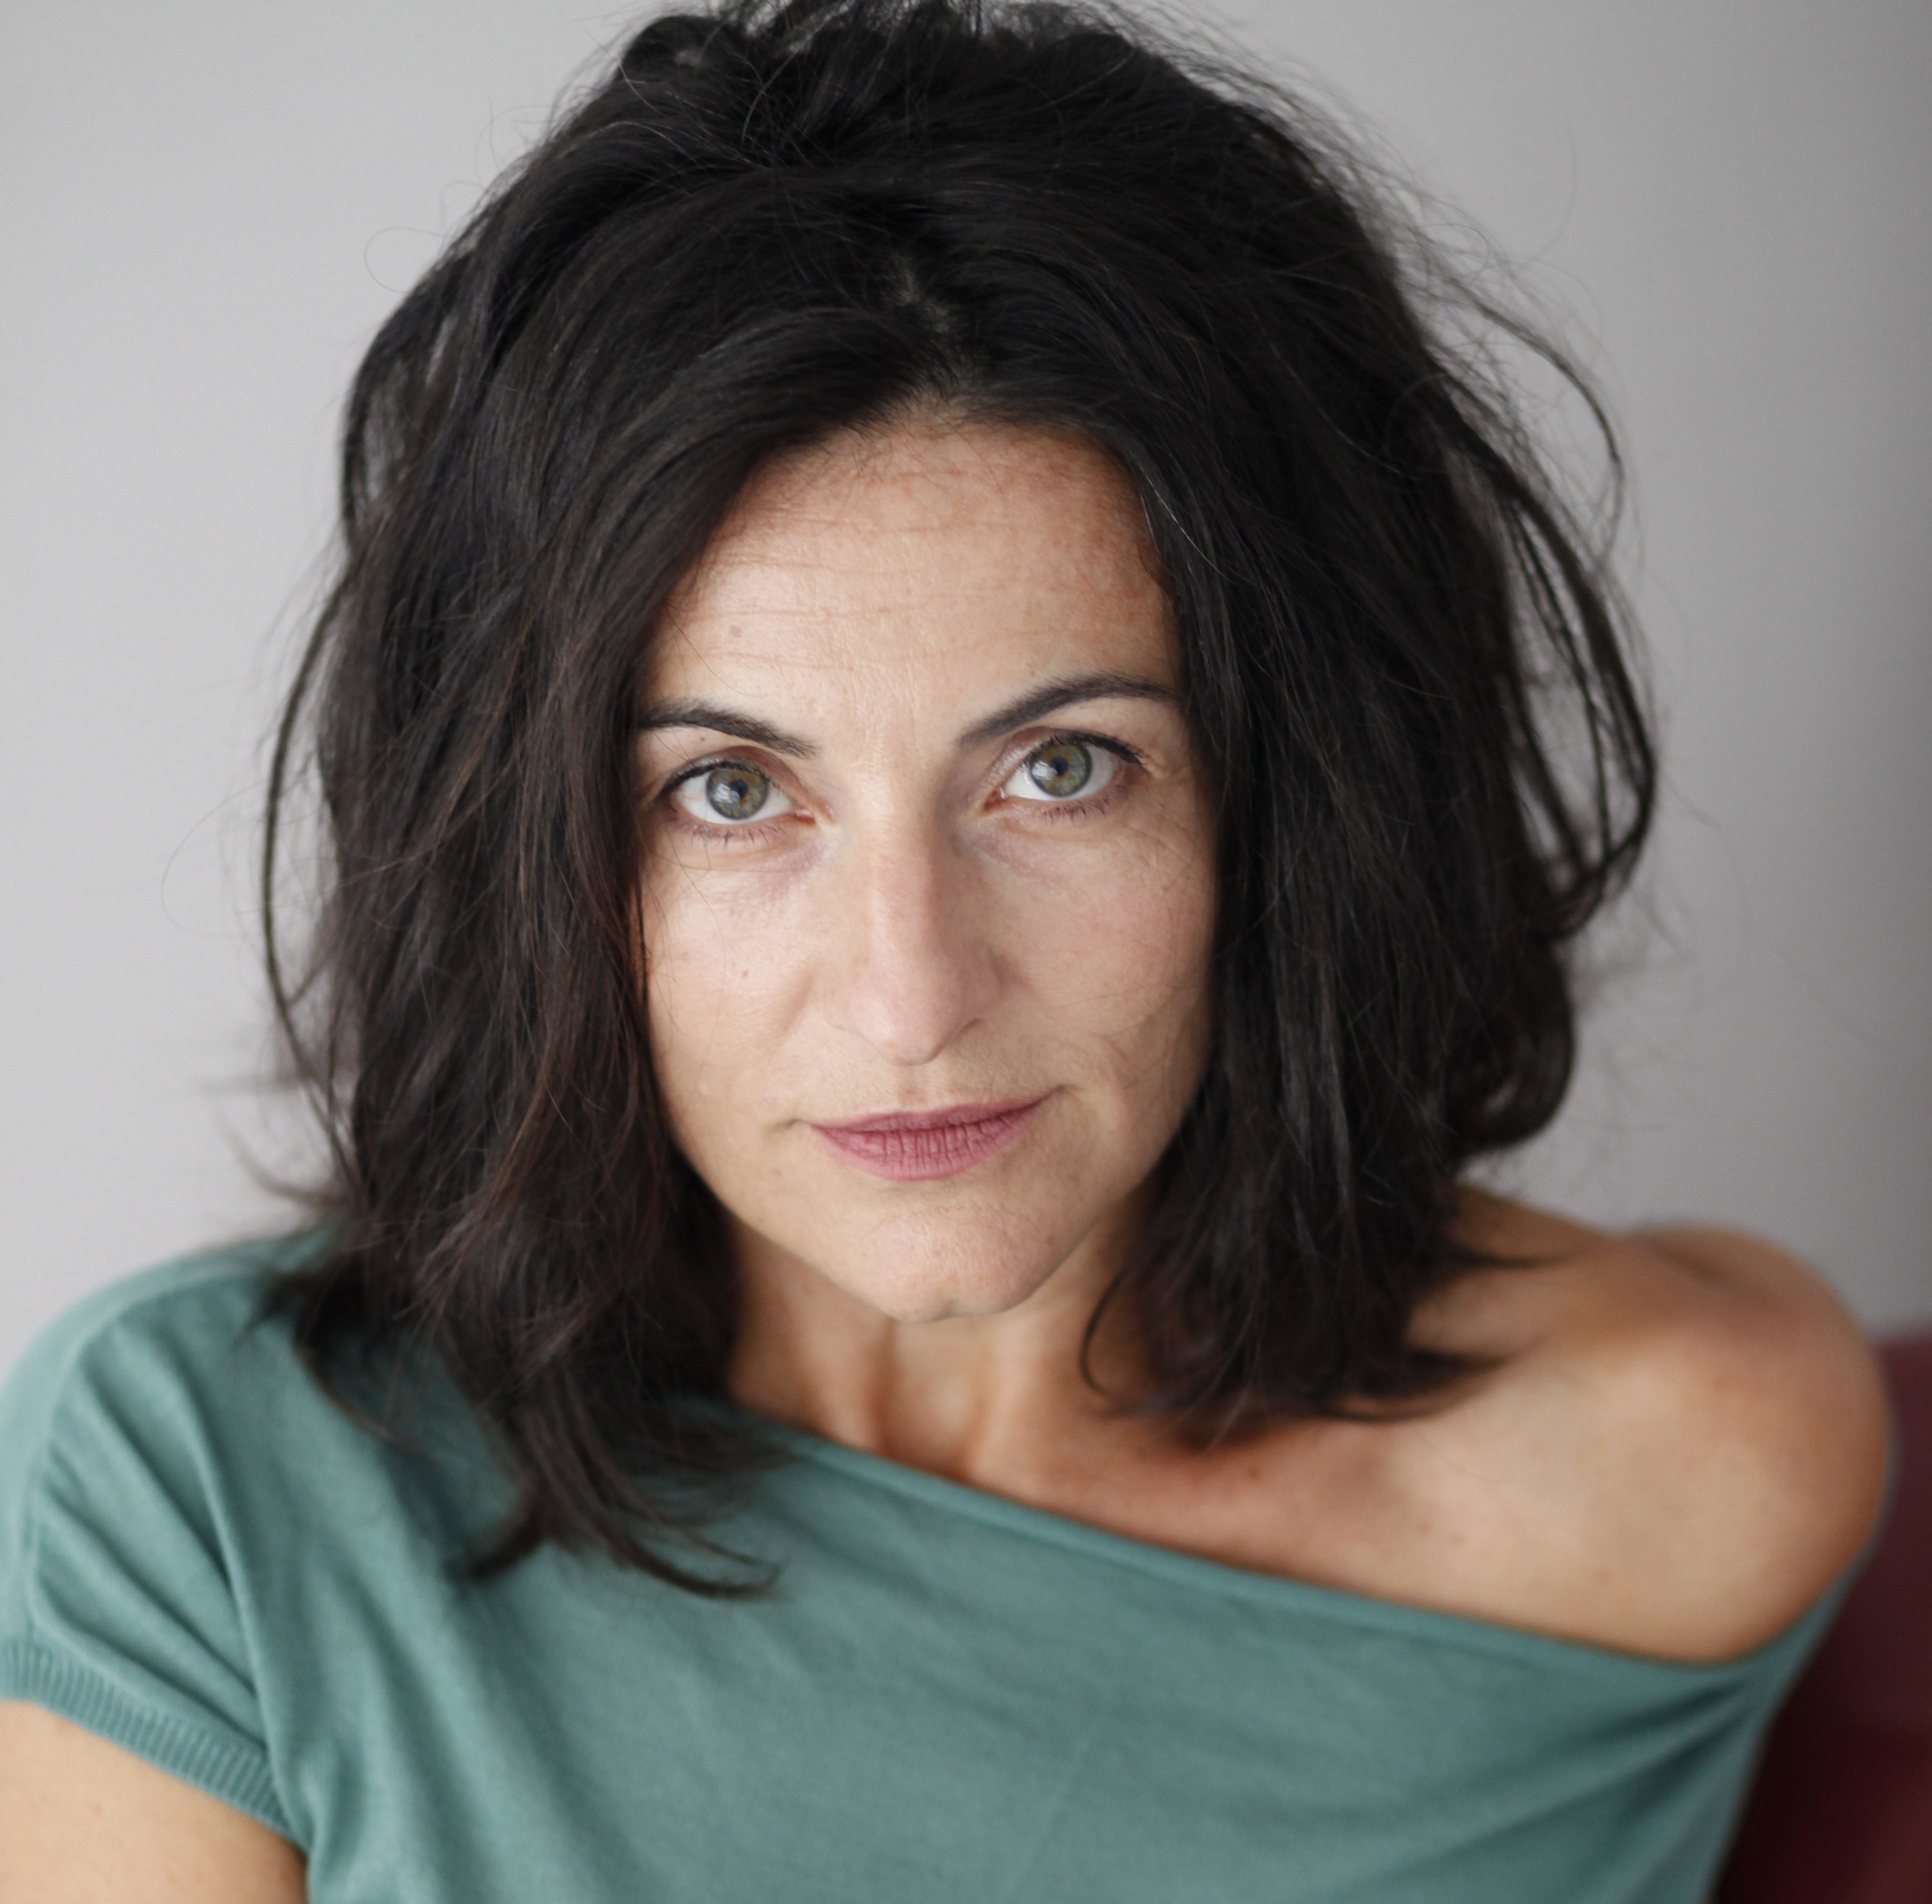 Mariangela Granelli - attive/actress